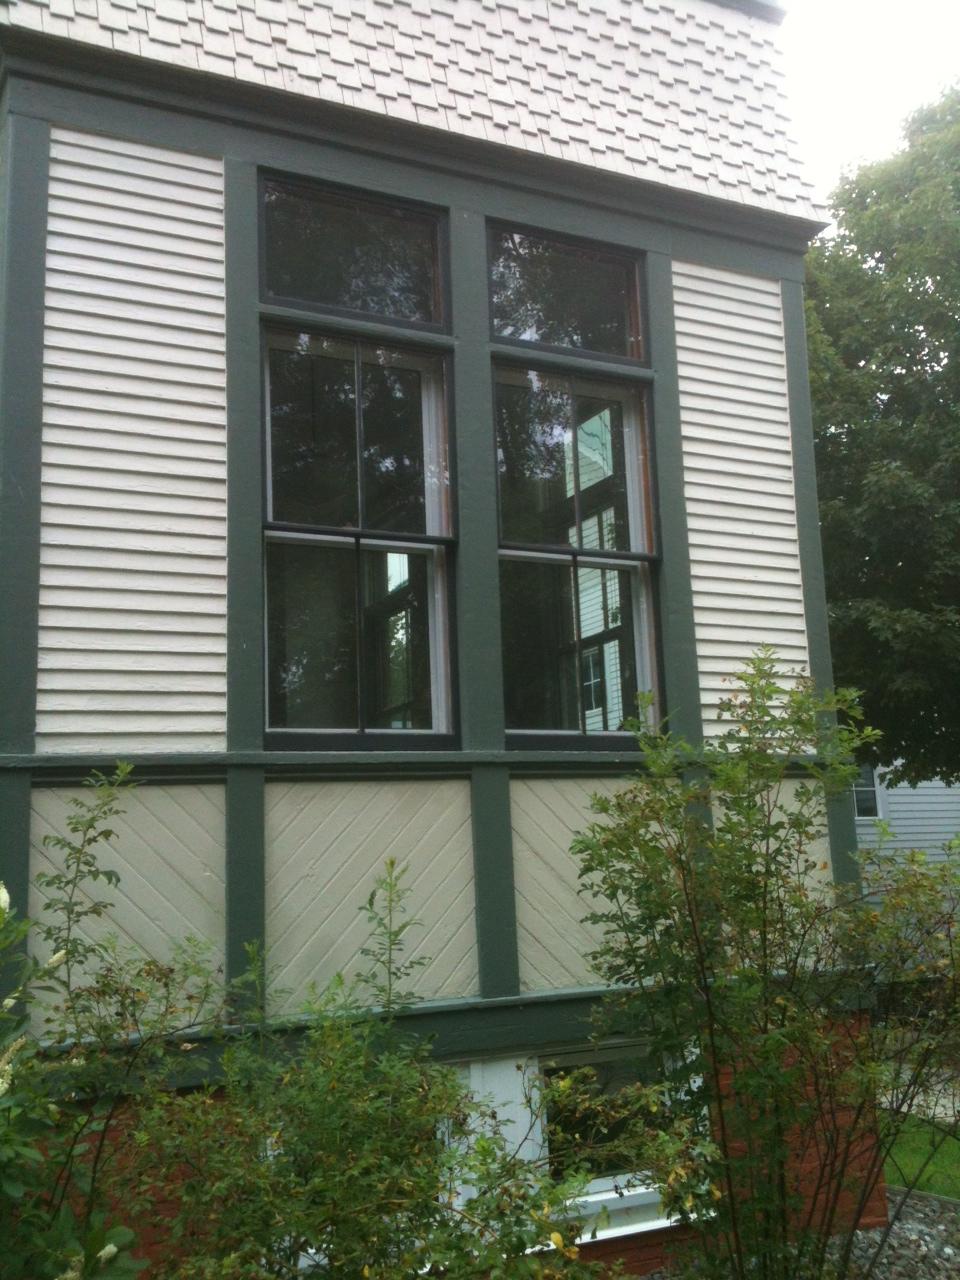 New interior storm windows preservation in pink for Interior storm windows